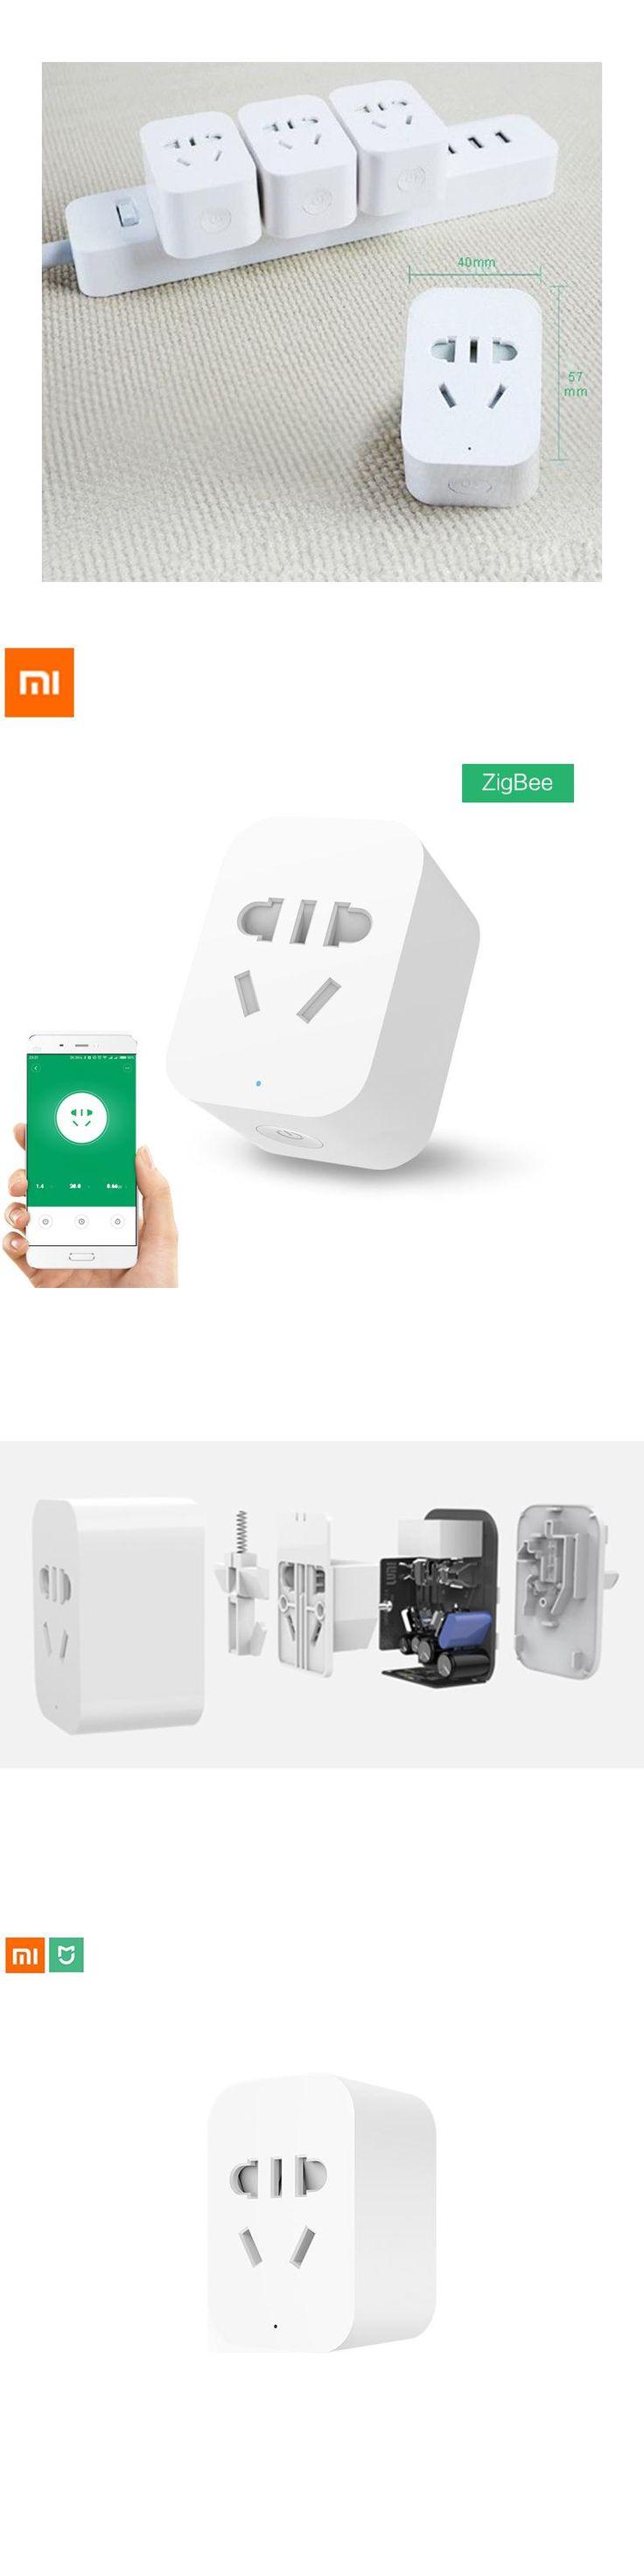 Original Xiaomi Mi Smart WiFi Socket Plug ZigBee Version Remote Control Accept EU US AU Plug Adaptor Using by Xiaomi Home APP